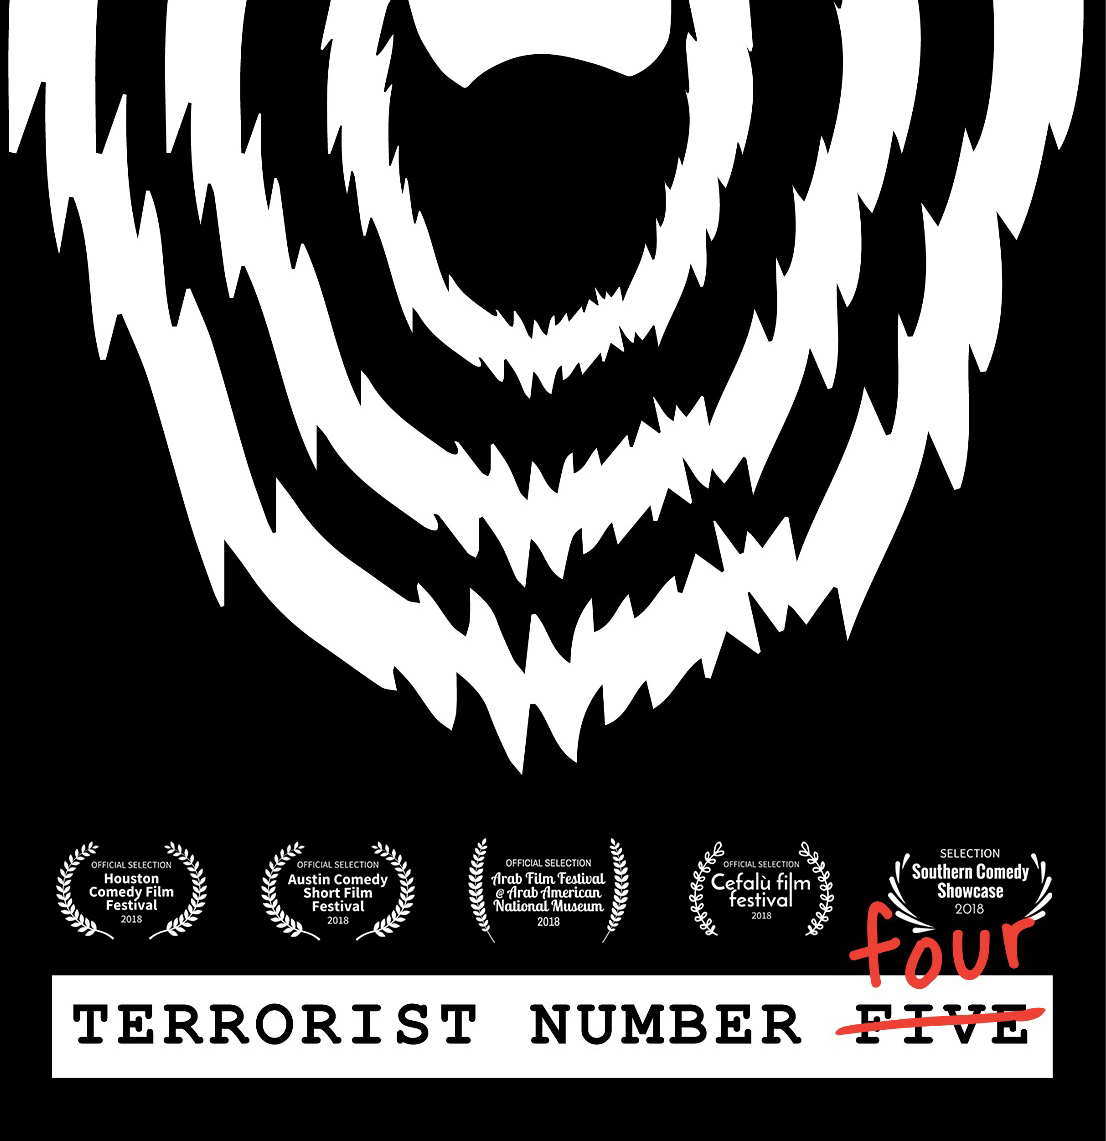 Terrorist+Number+Four+poster+final.jpg